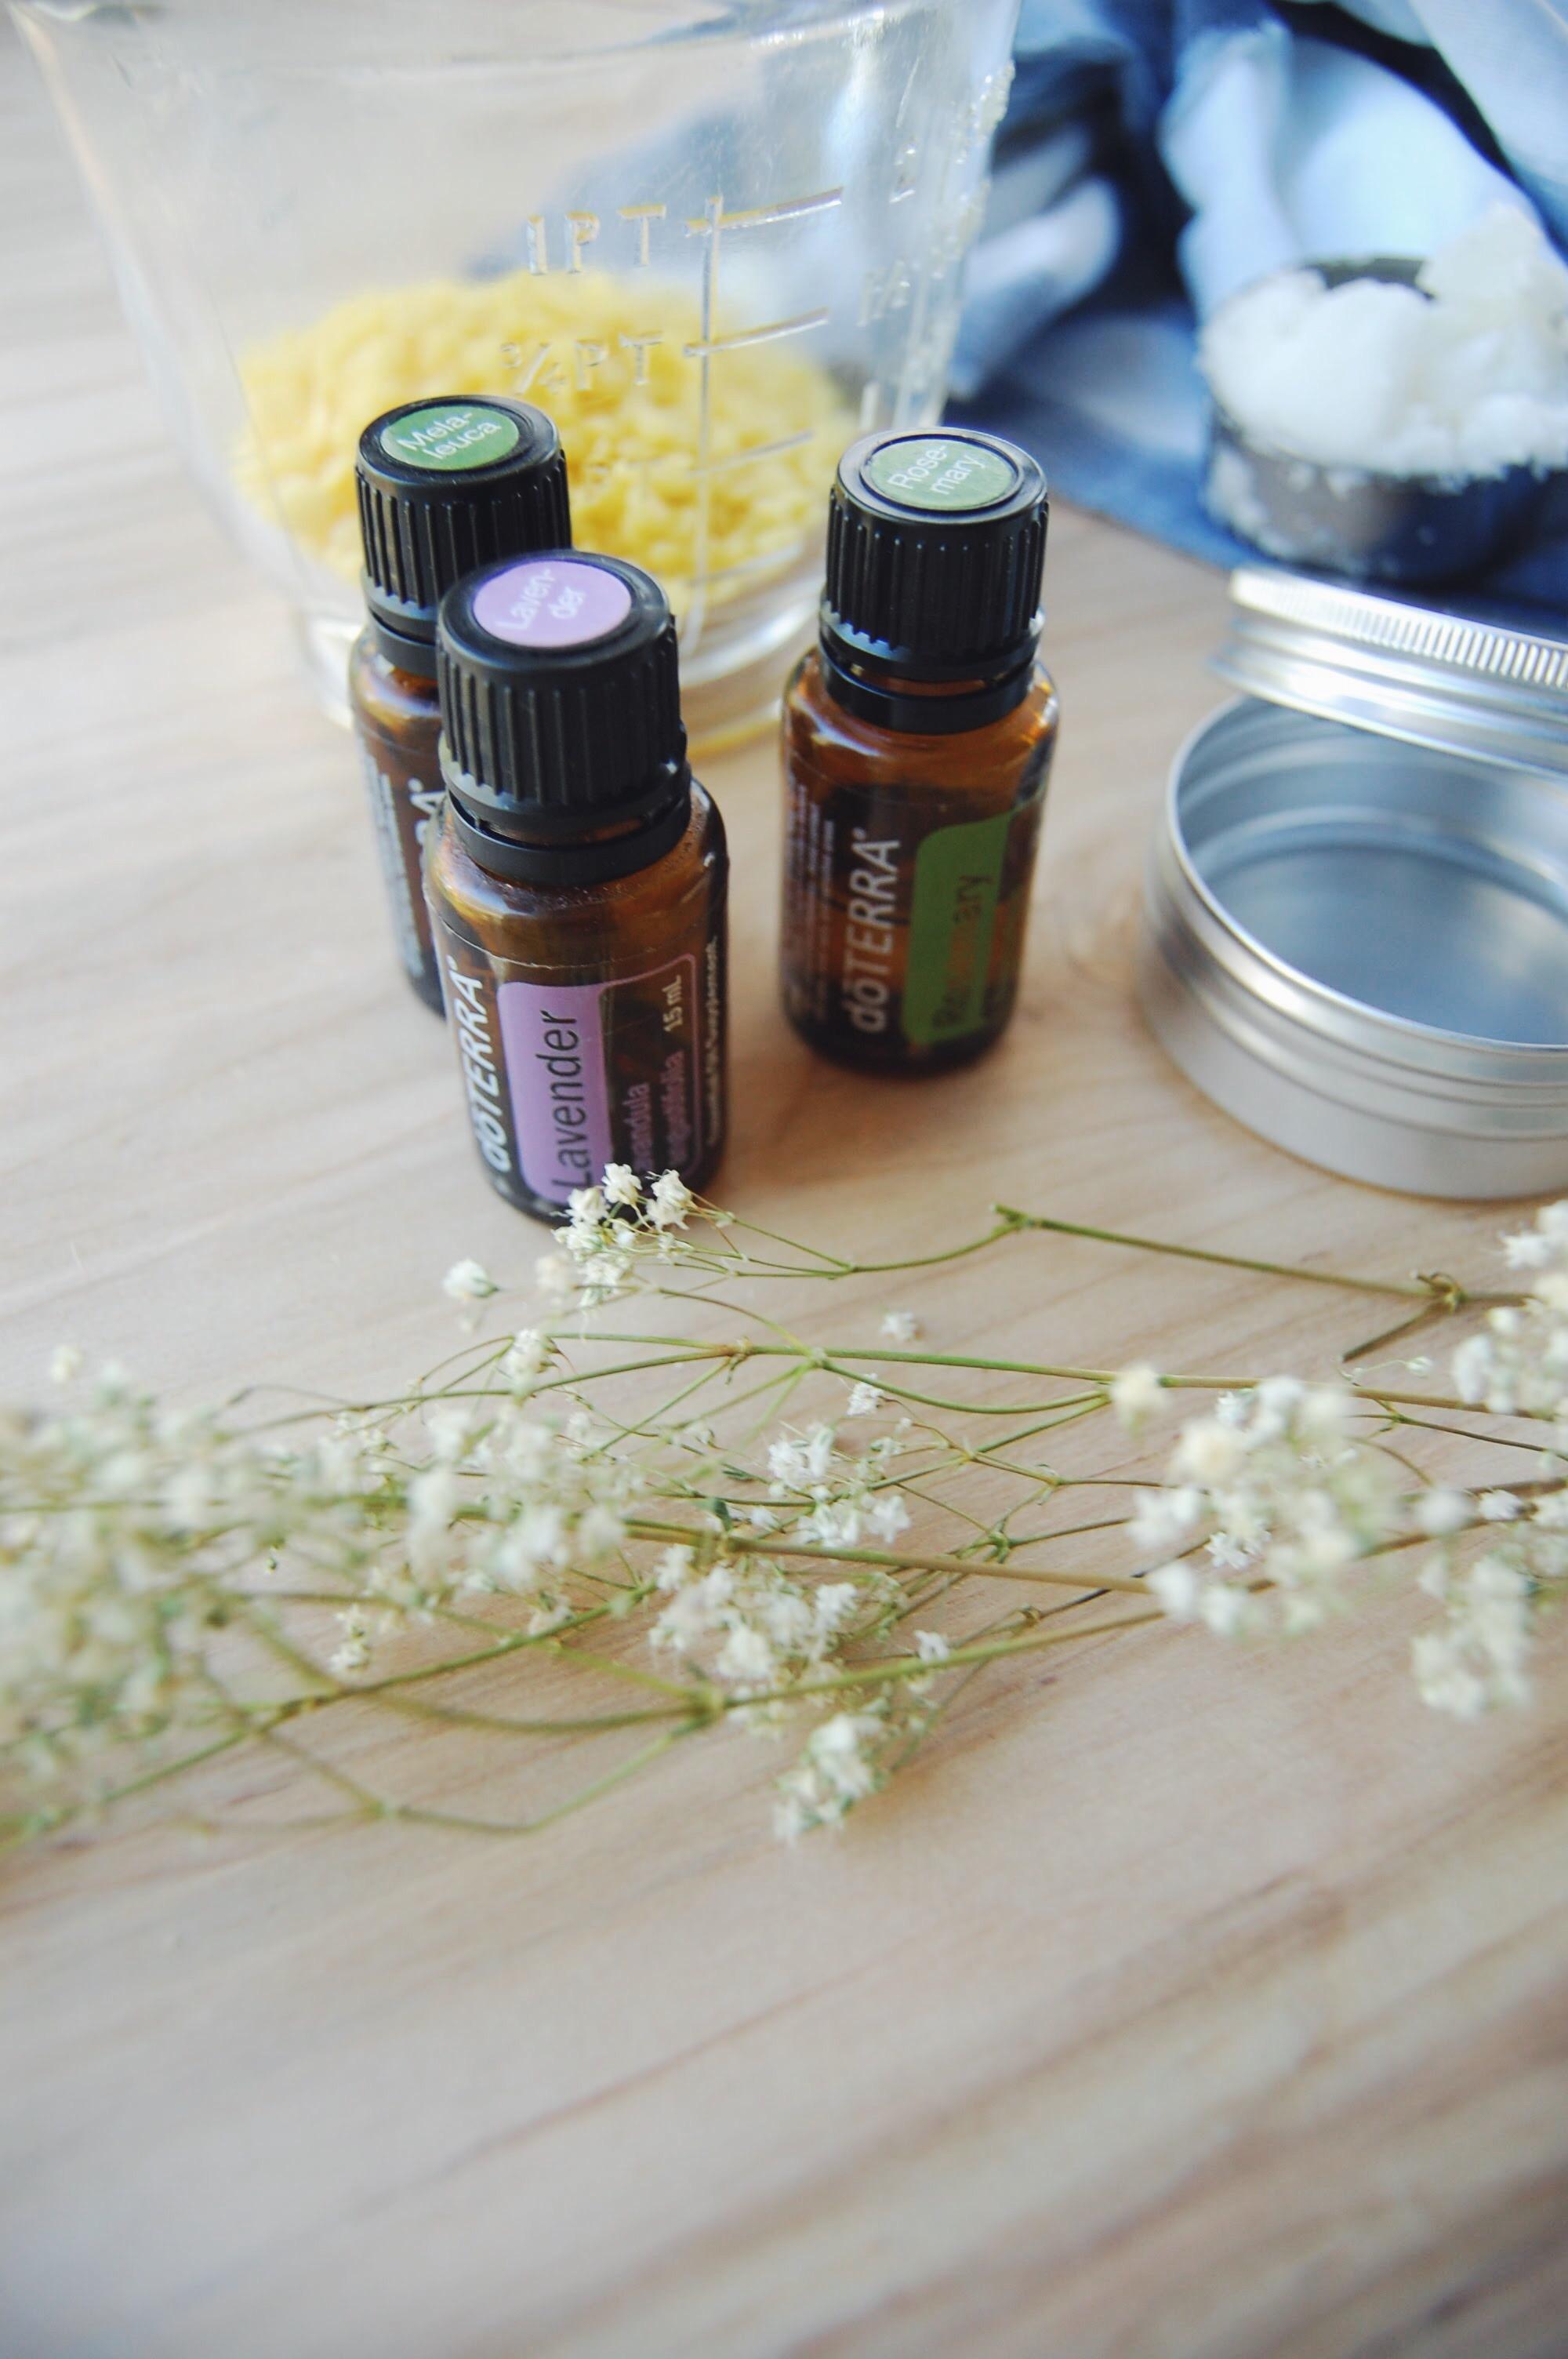 Garden Salve Oils